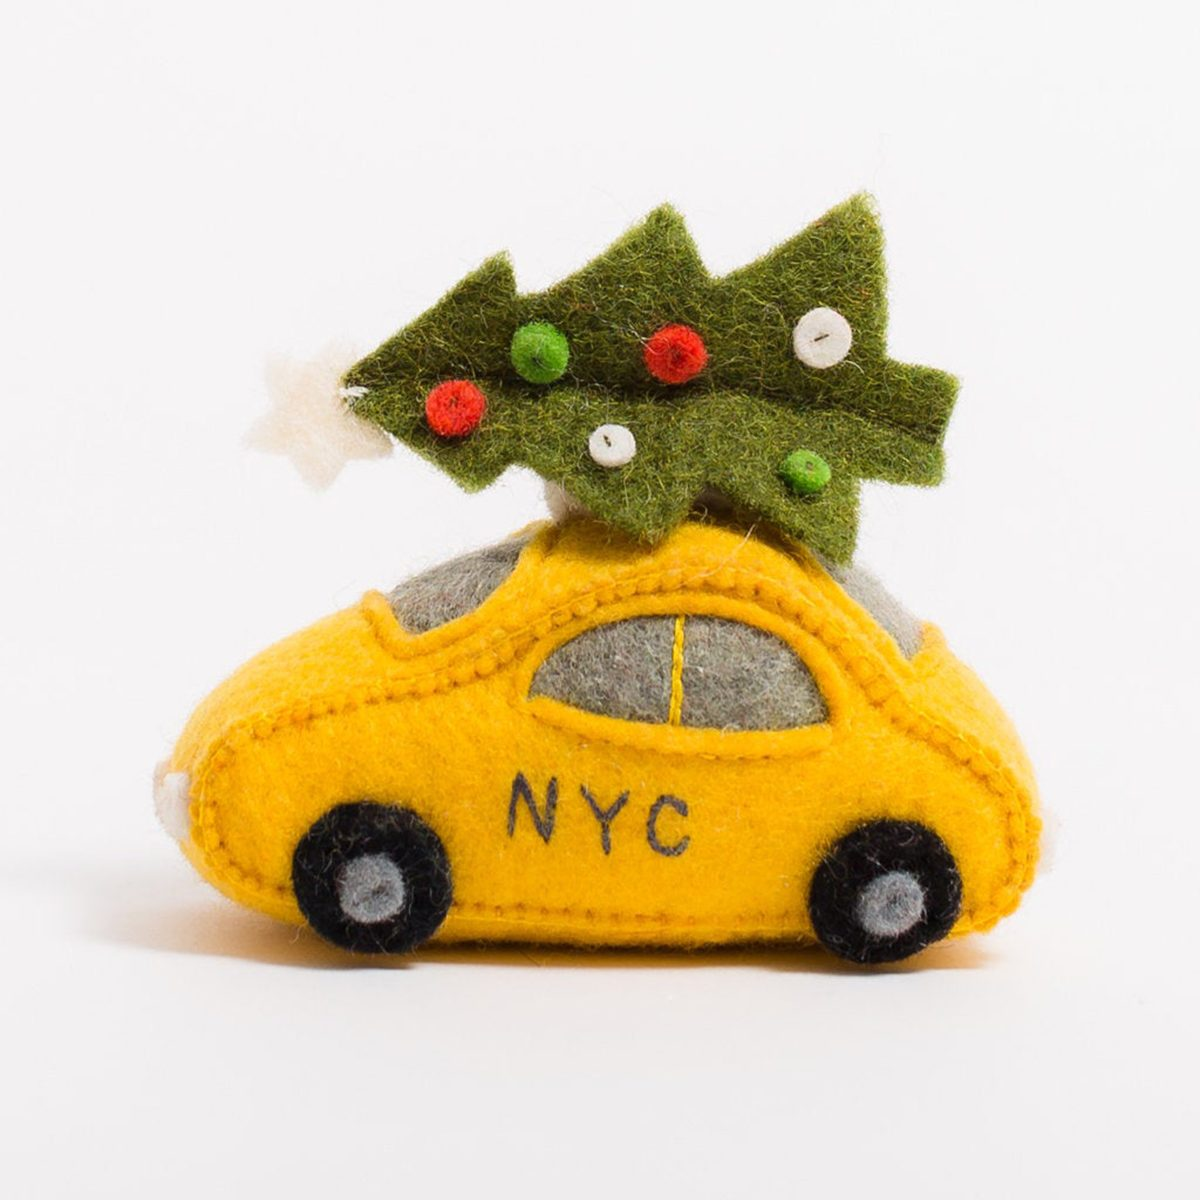 Felt Taxi Ornament, Holiday Taxi, Felt Christmas Ornament